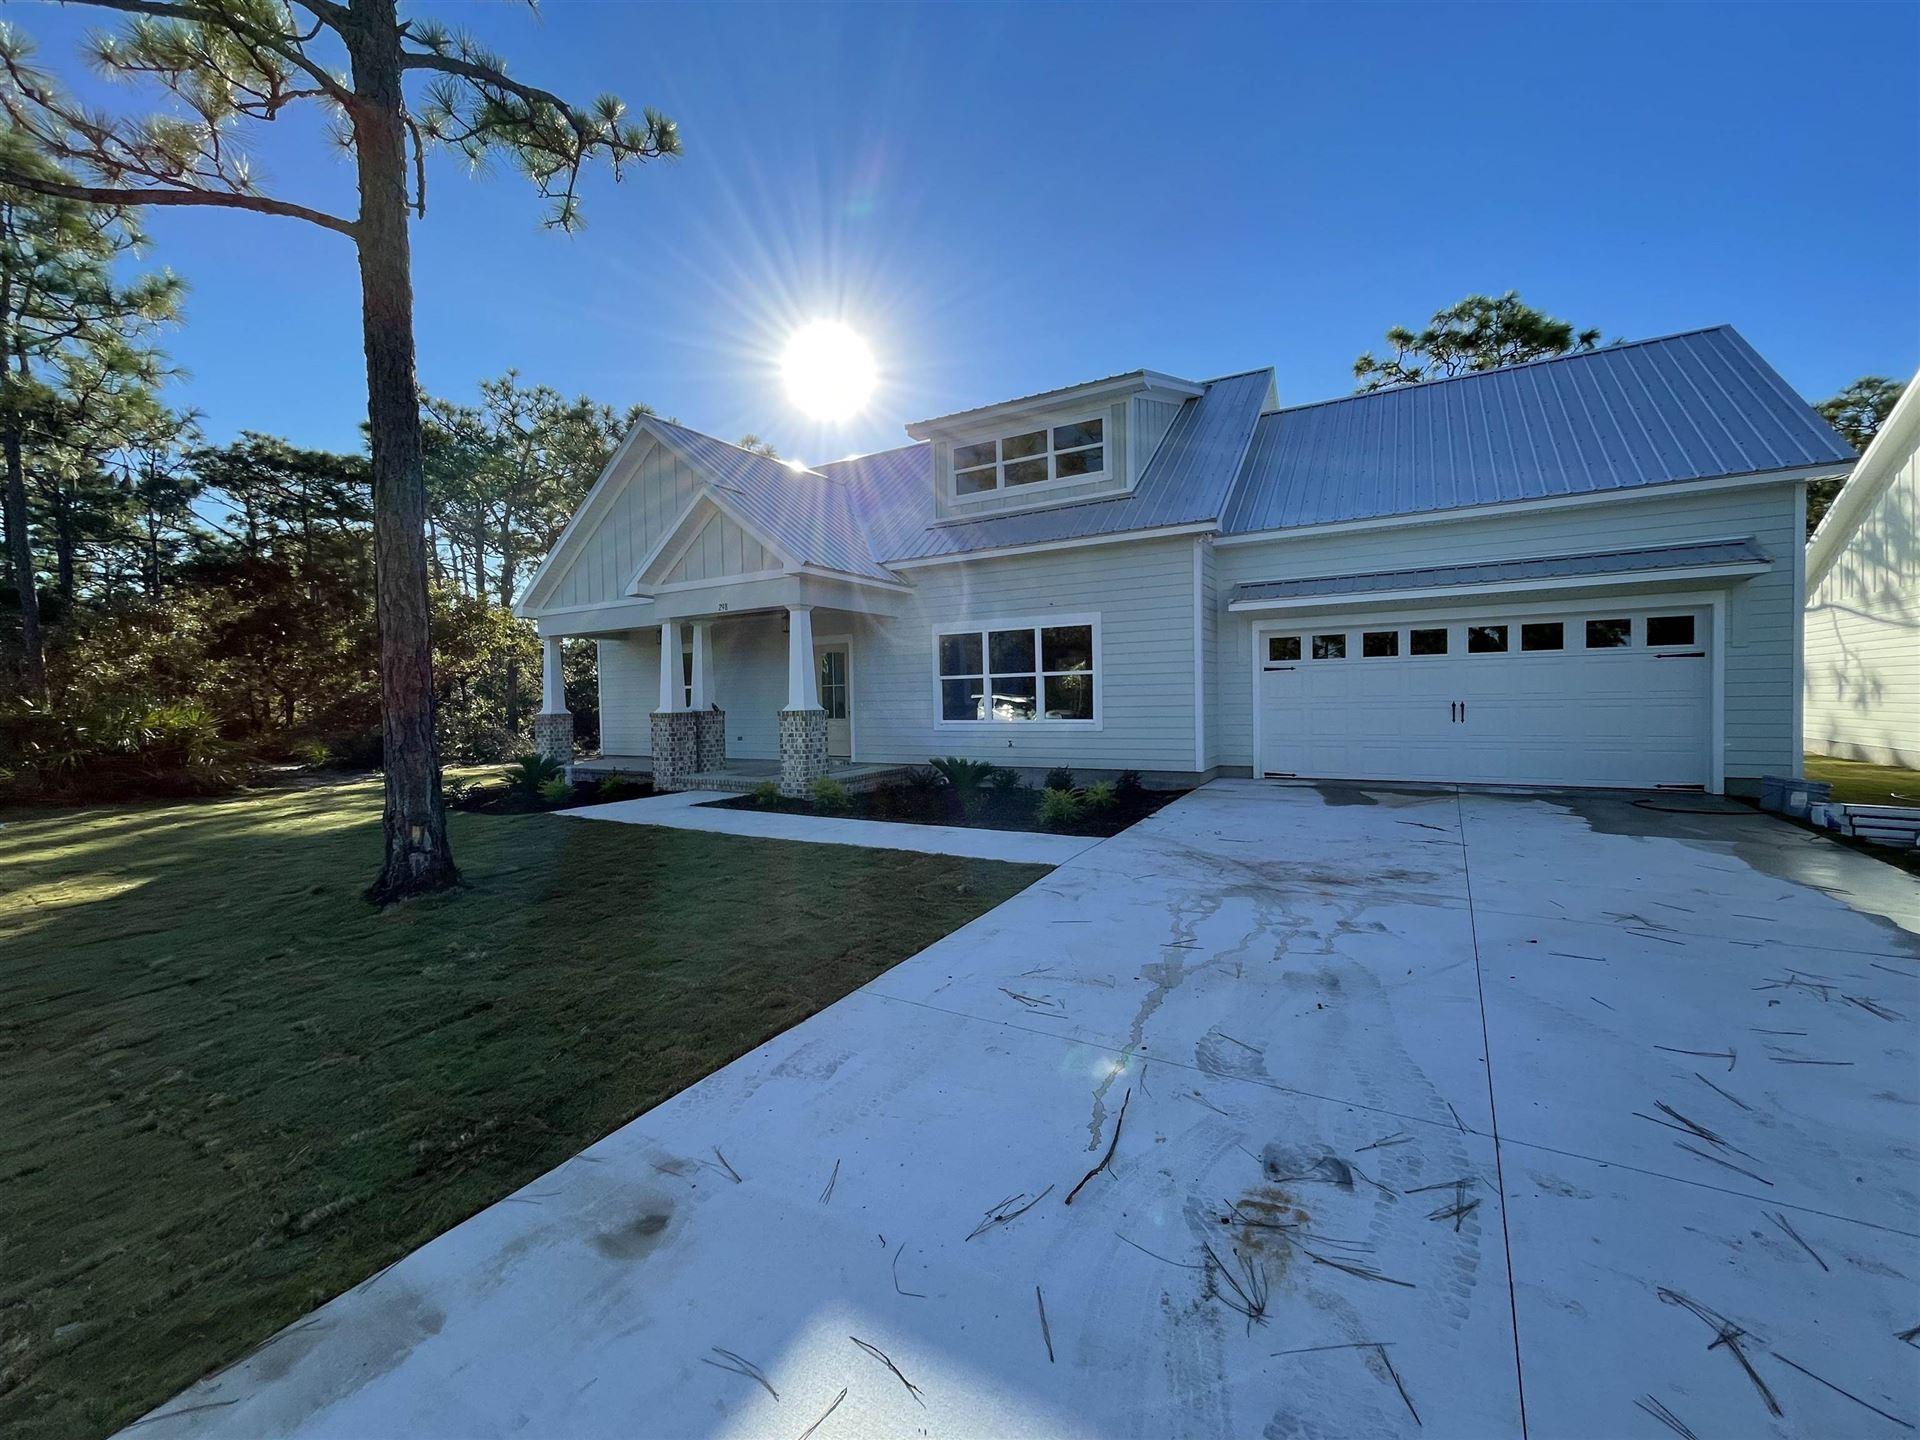 298 Royal Tern Way, Carabelle, FL 32323 - MLS#: 331306